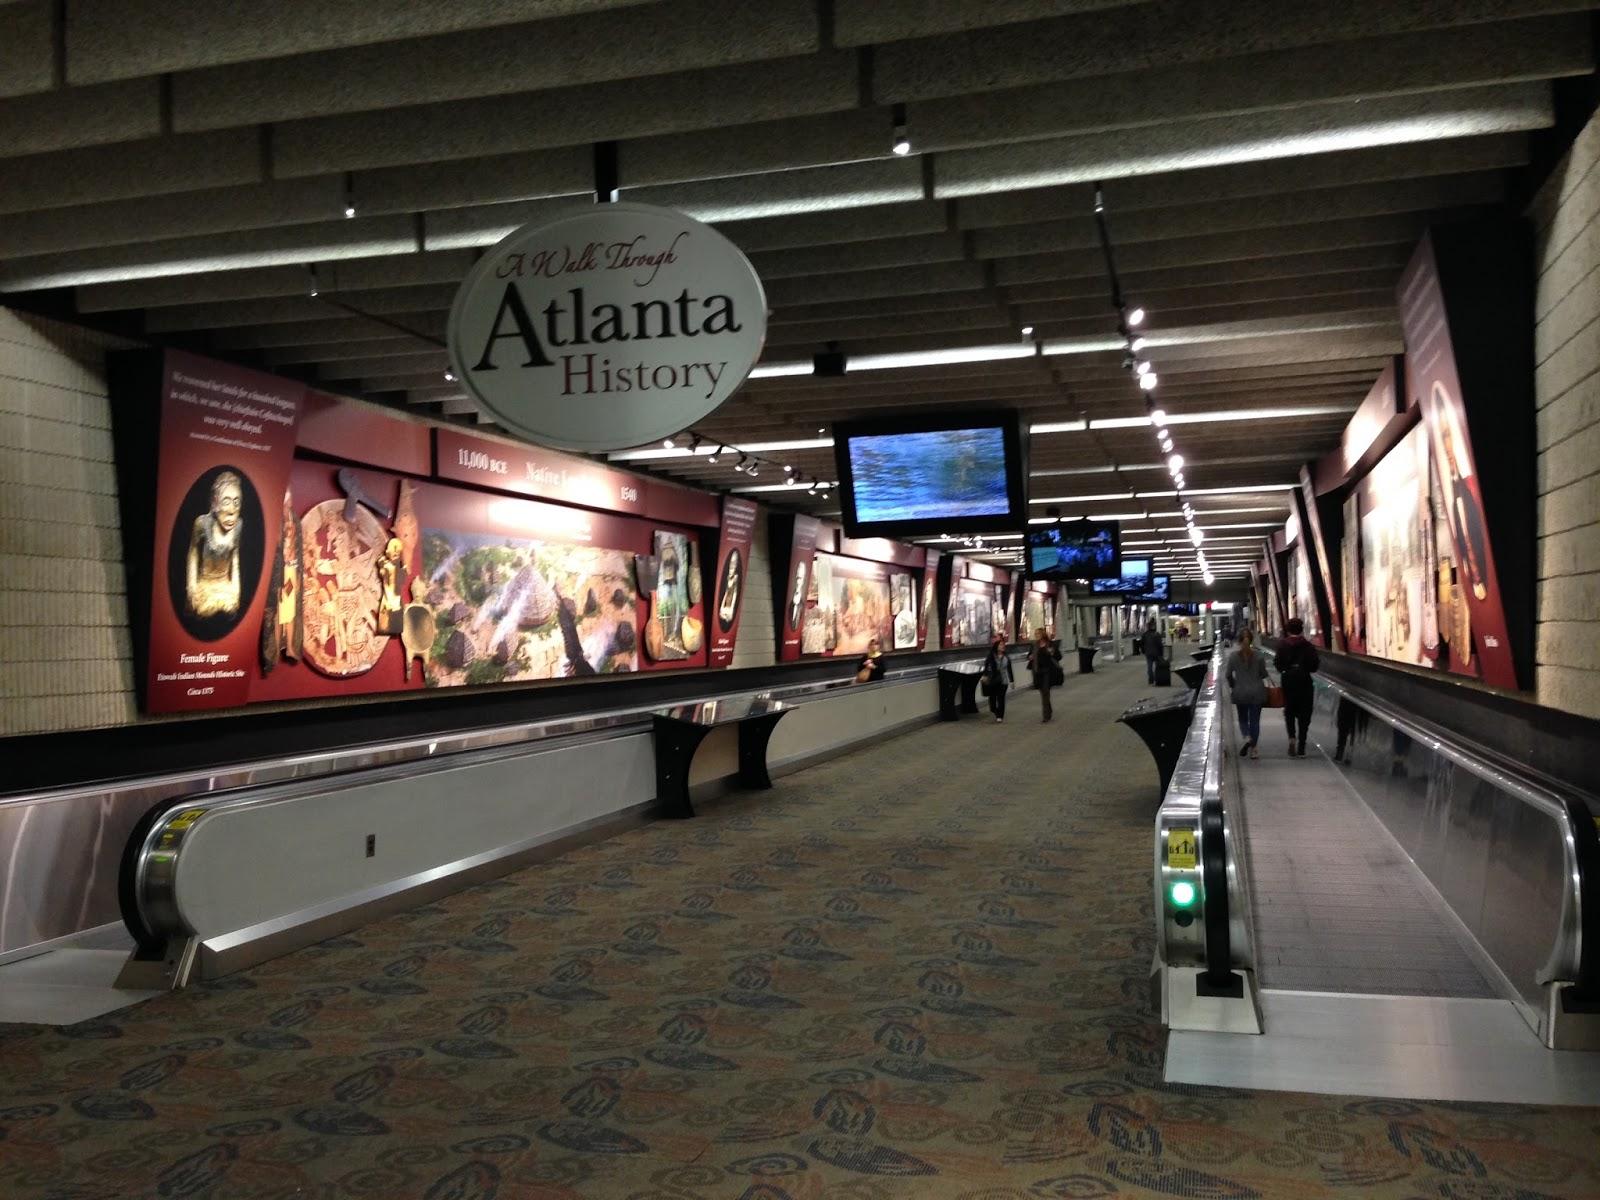 Weird Wacky And Wild South Underground Atlanta Airport